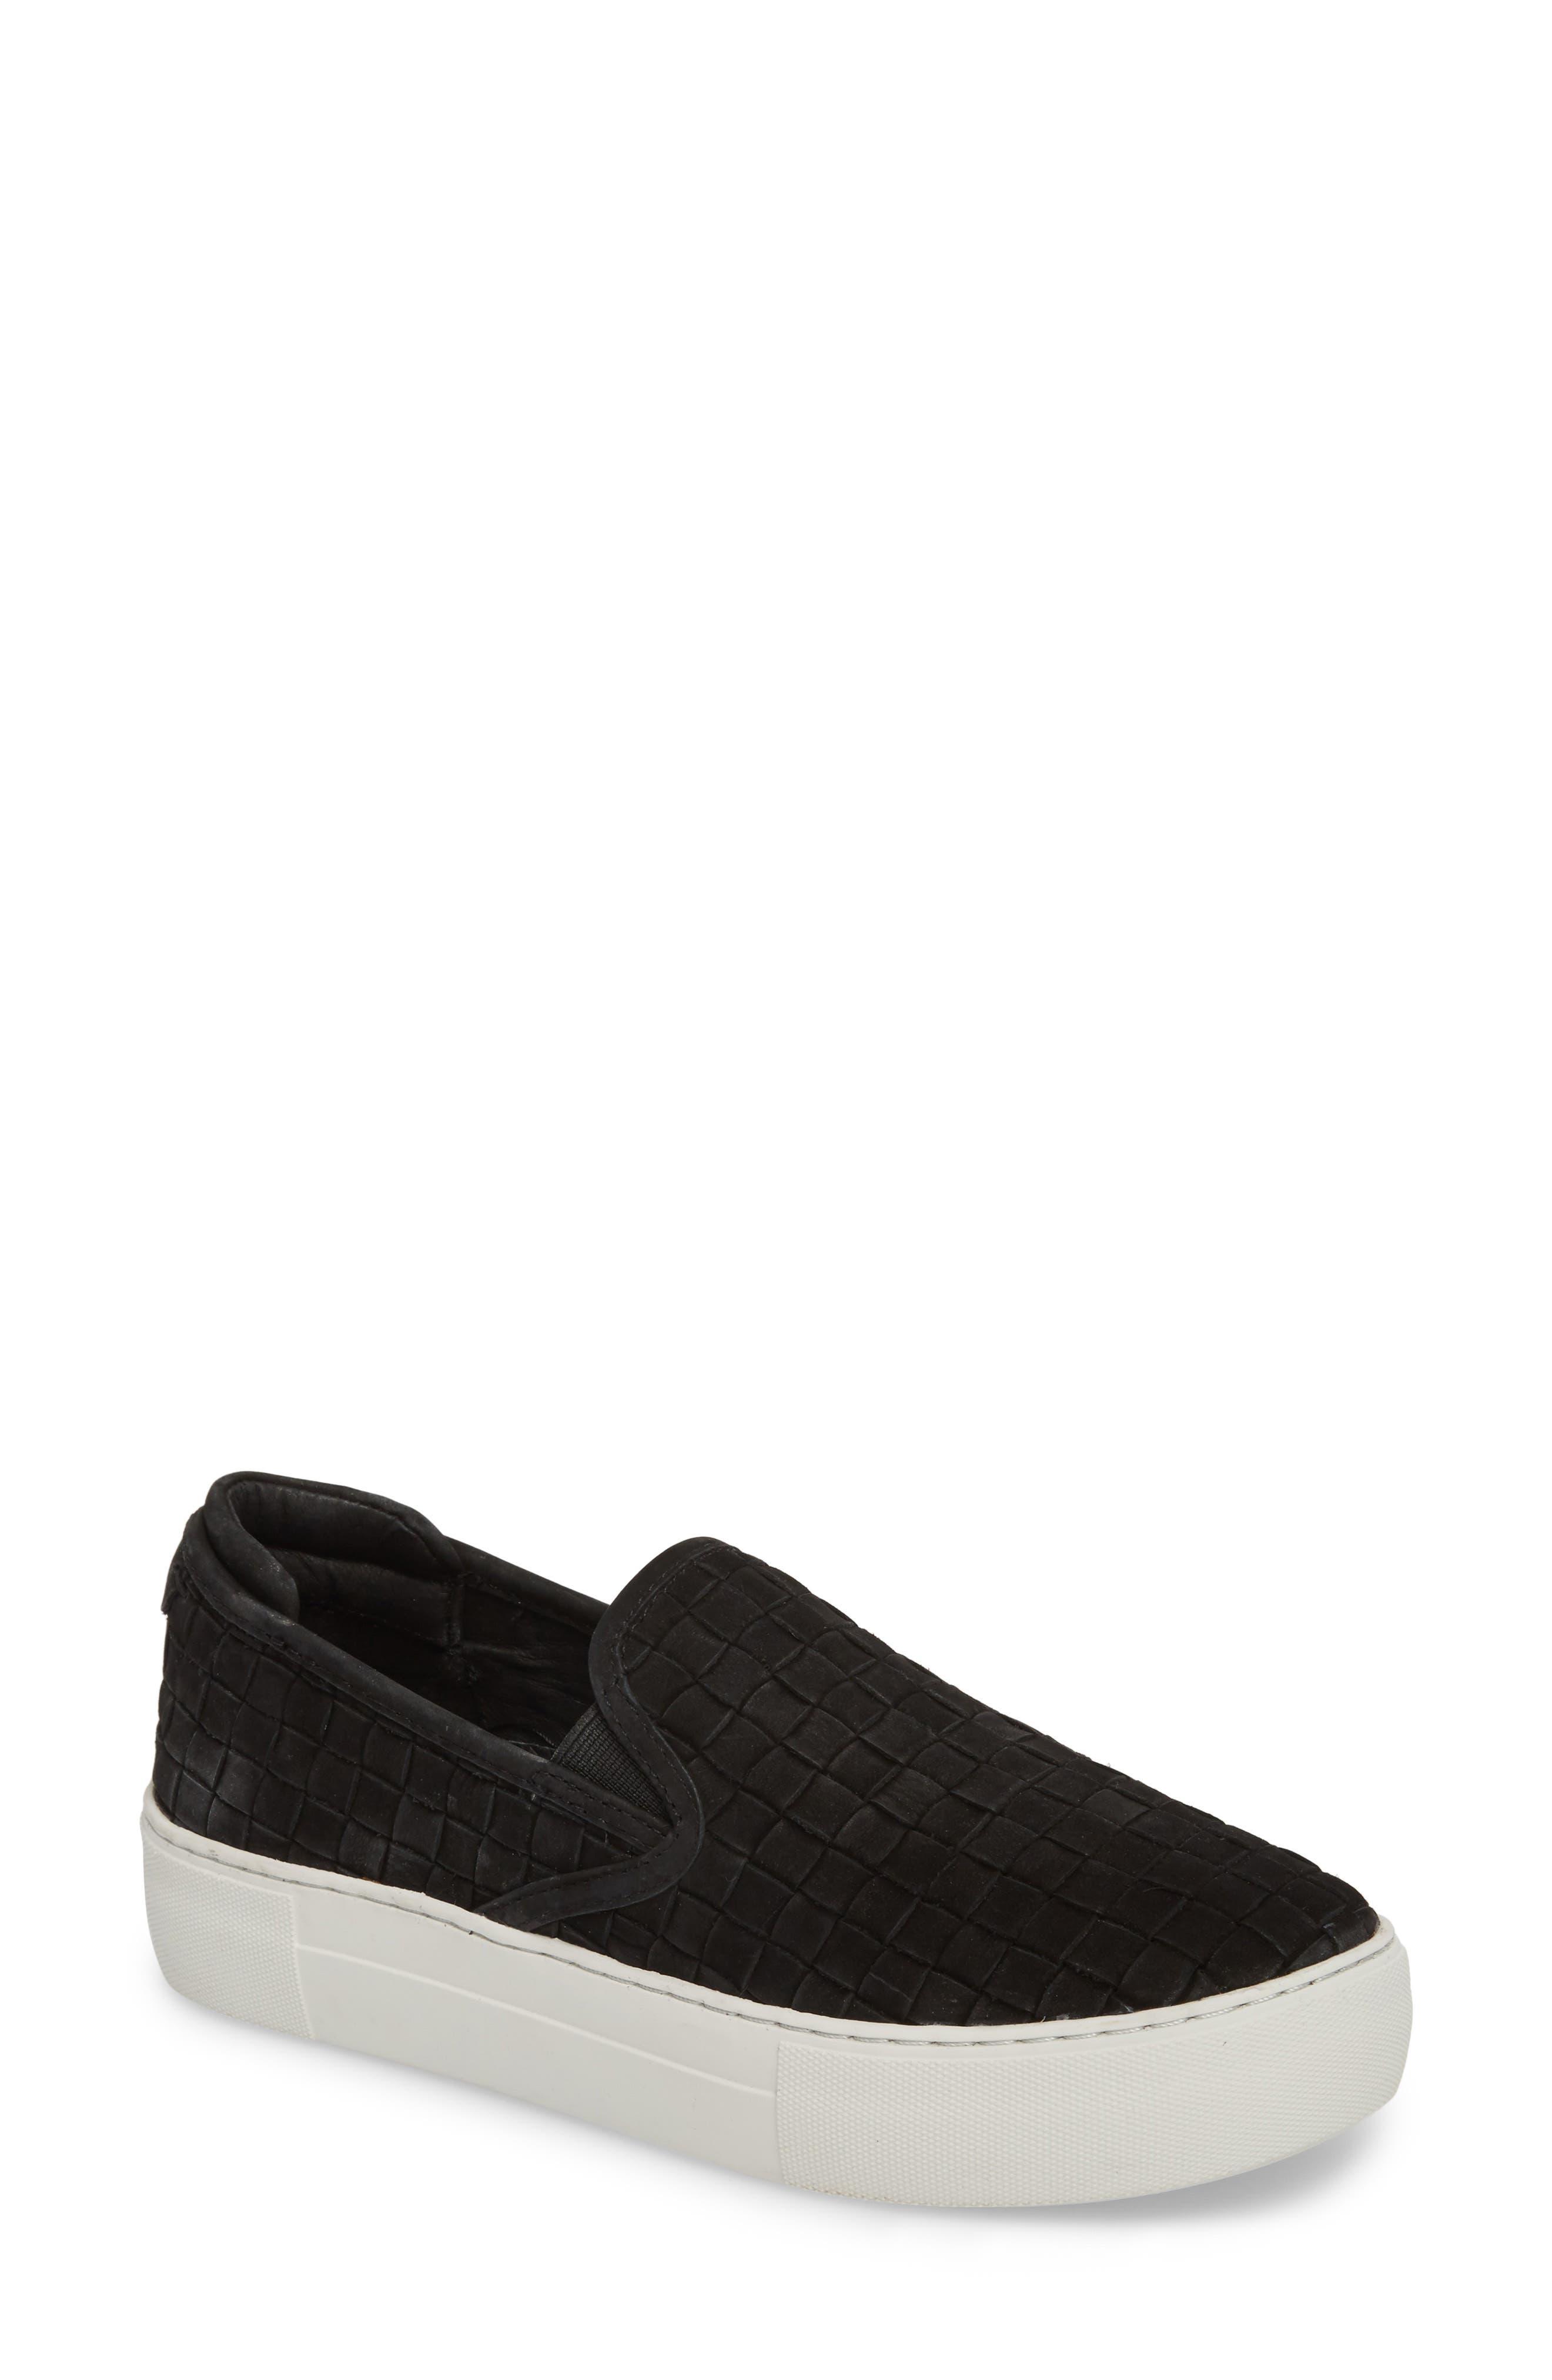 Proper Slip-On Sneaker,                         Main,                         color, BLACK NUBUCK